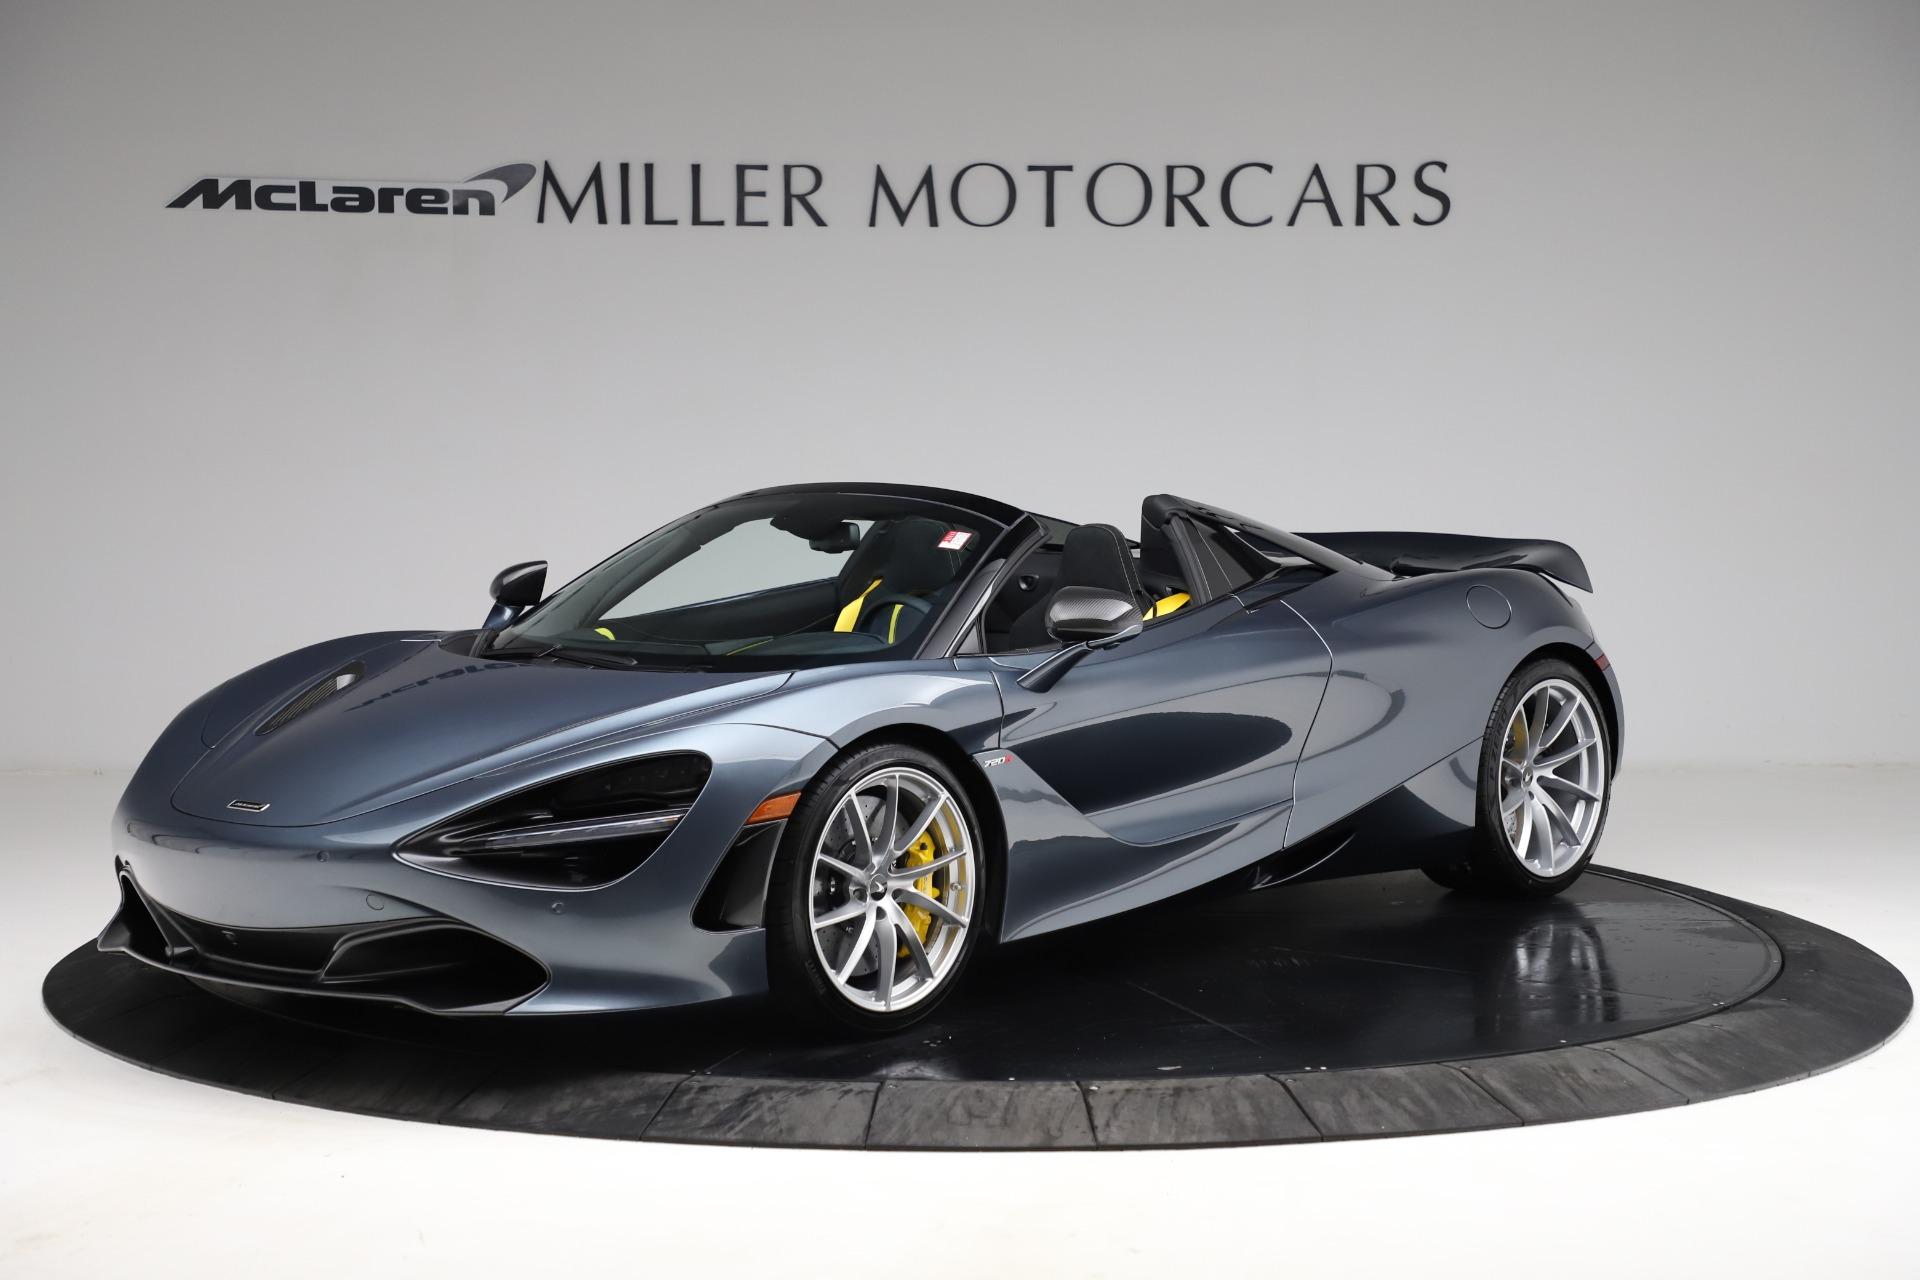 New 2021 McLaren 720S Spider for sale $351,450 at Bentley Greenwich in Greenwich CT 06830 1